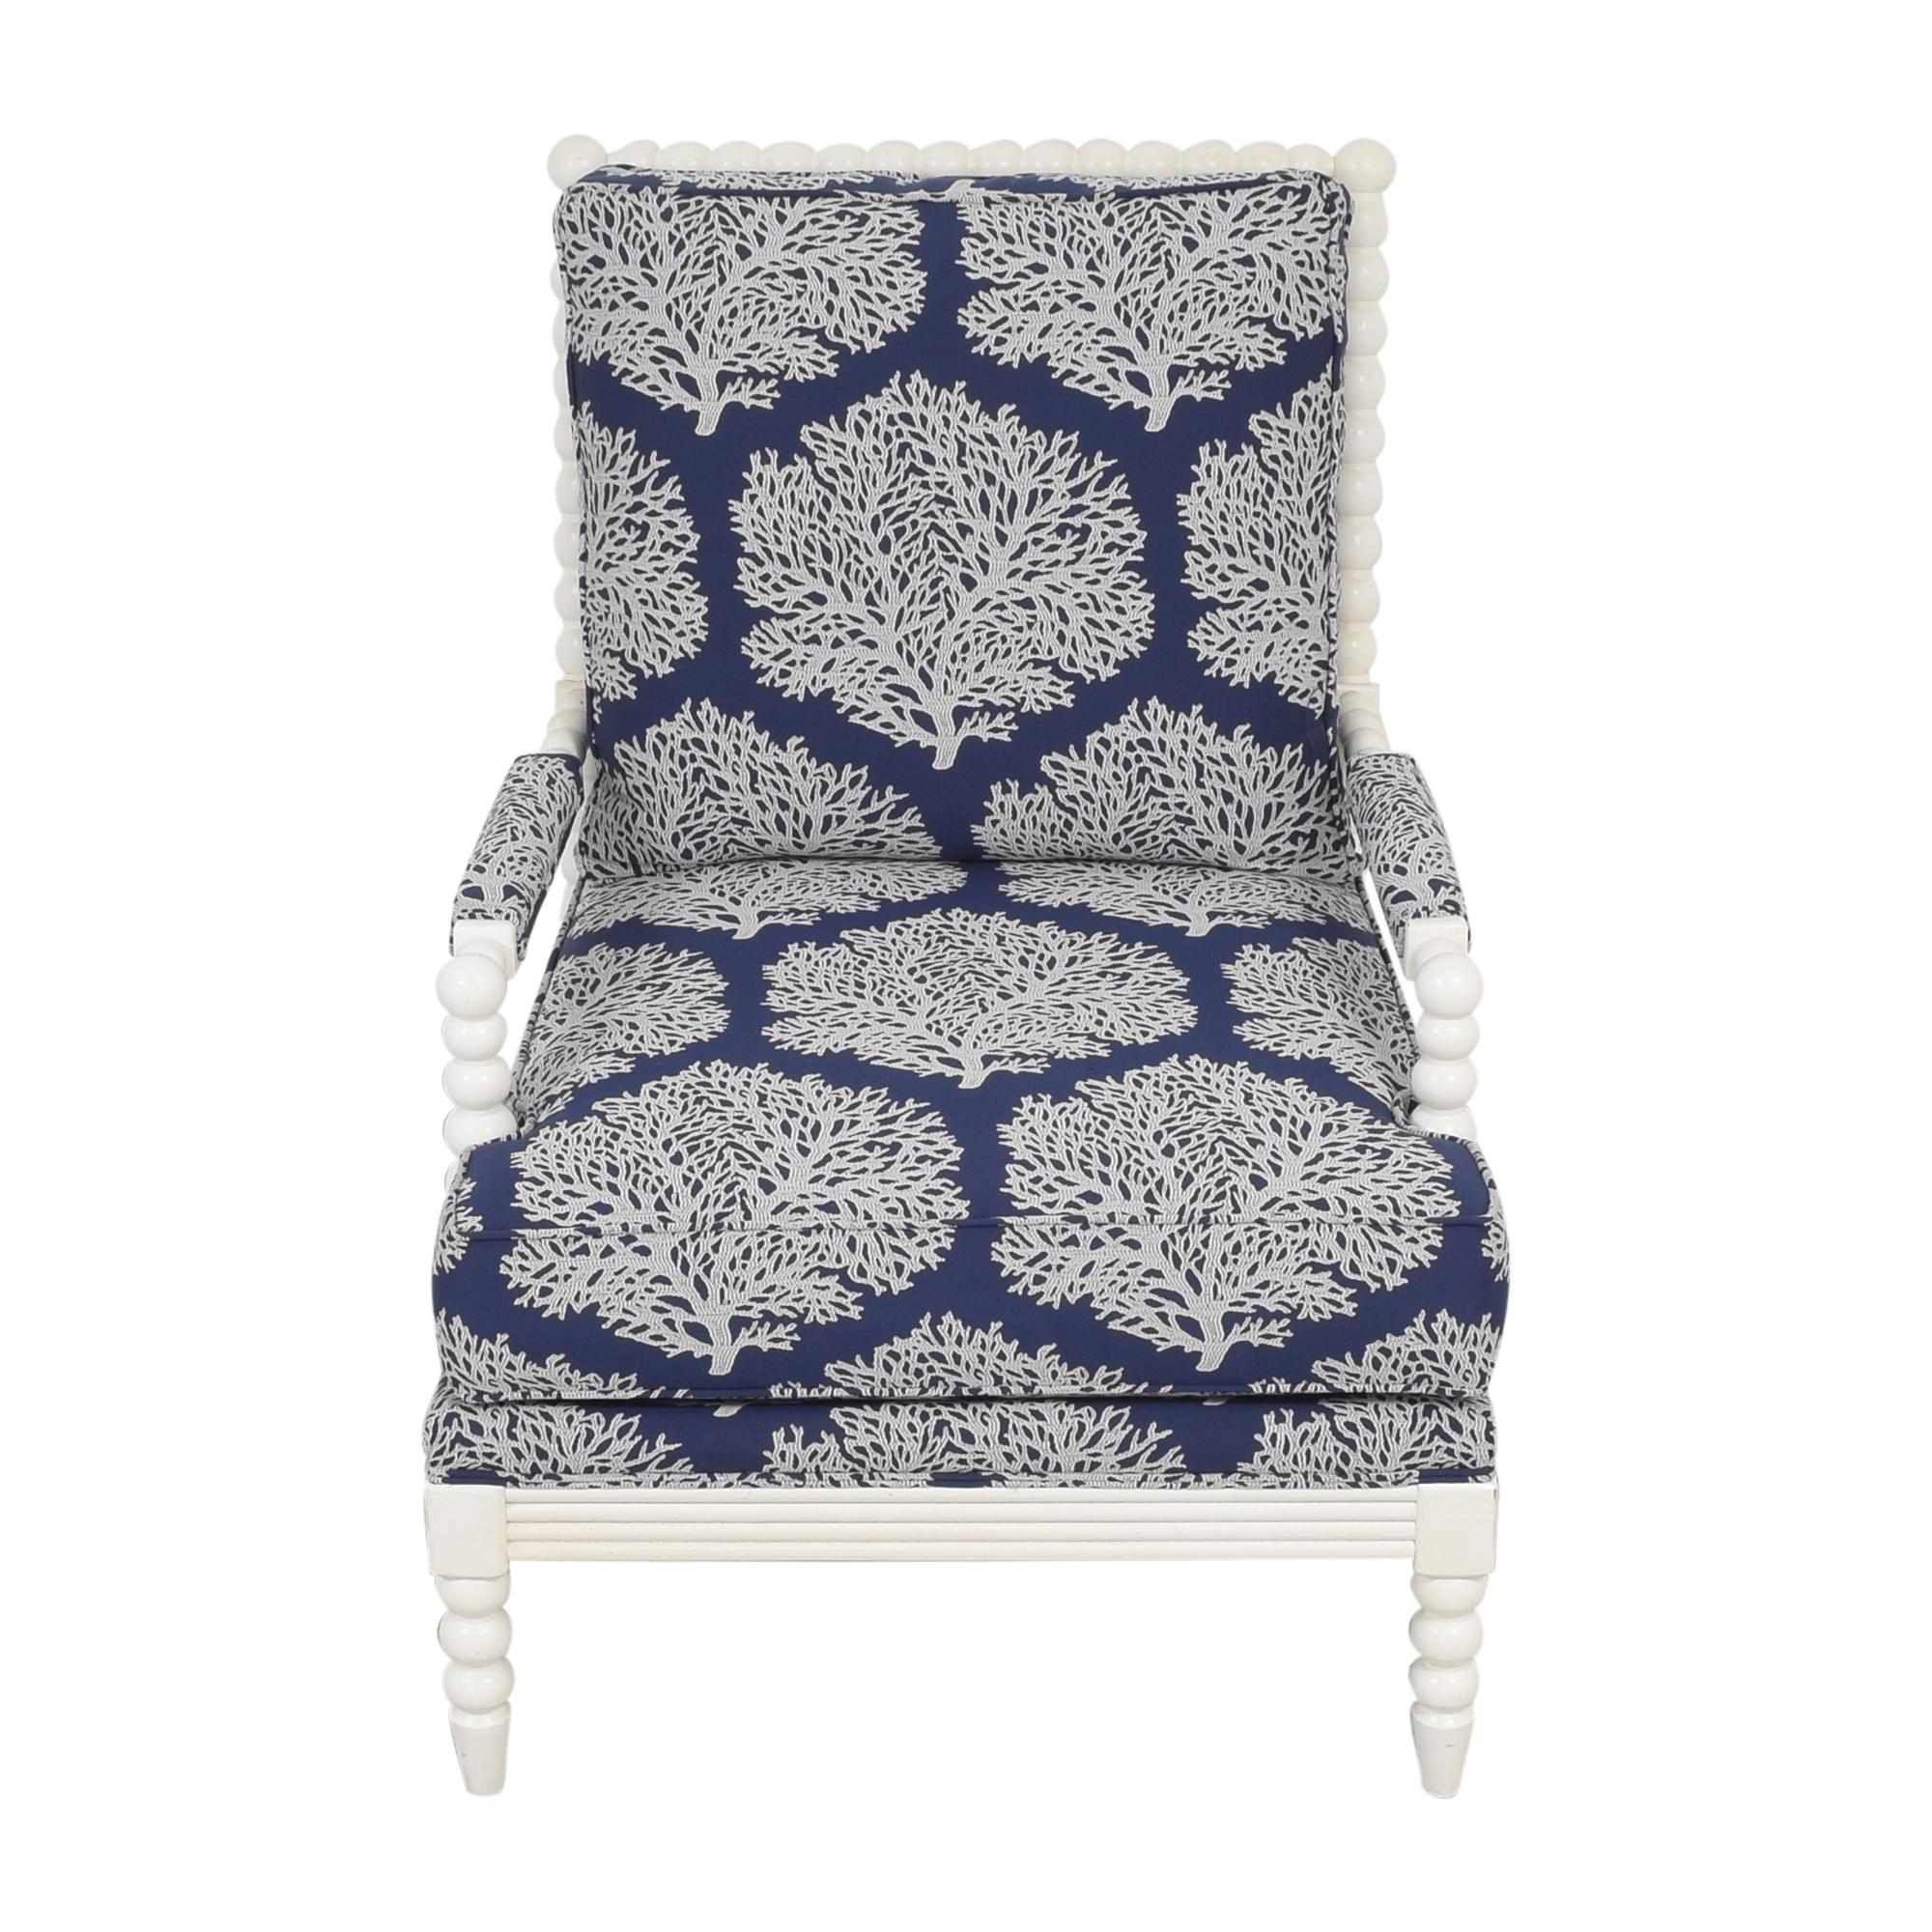 Ethan Allen Ethan Allen Custom Brandt Chair price